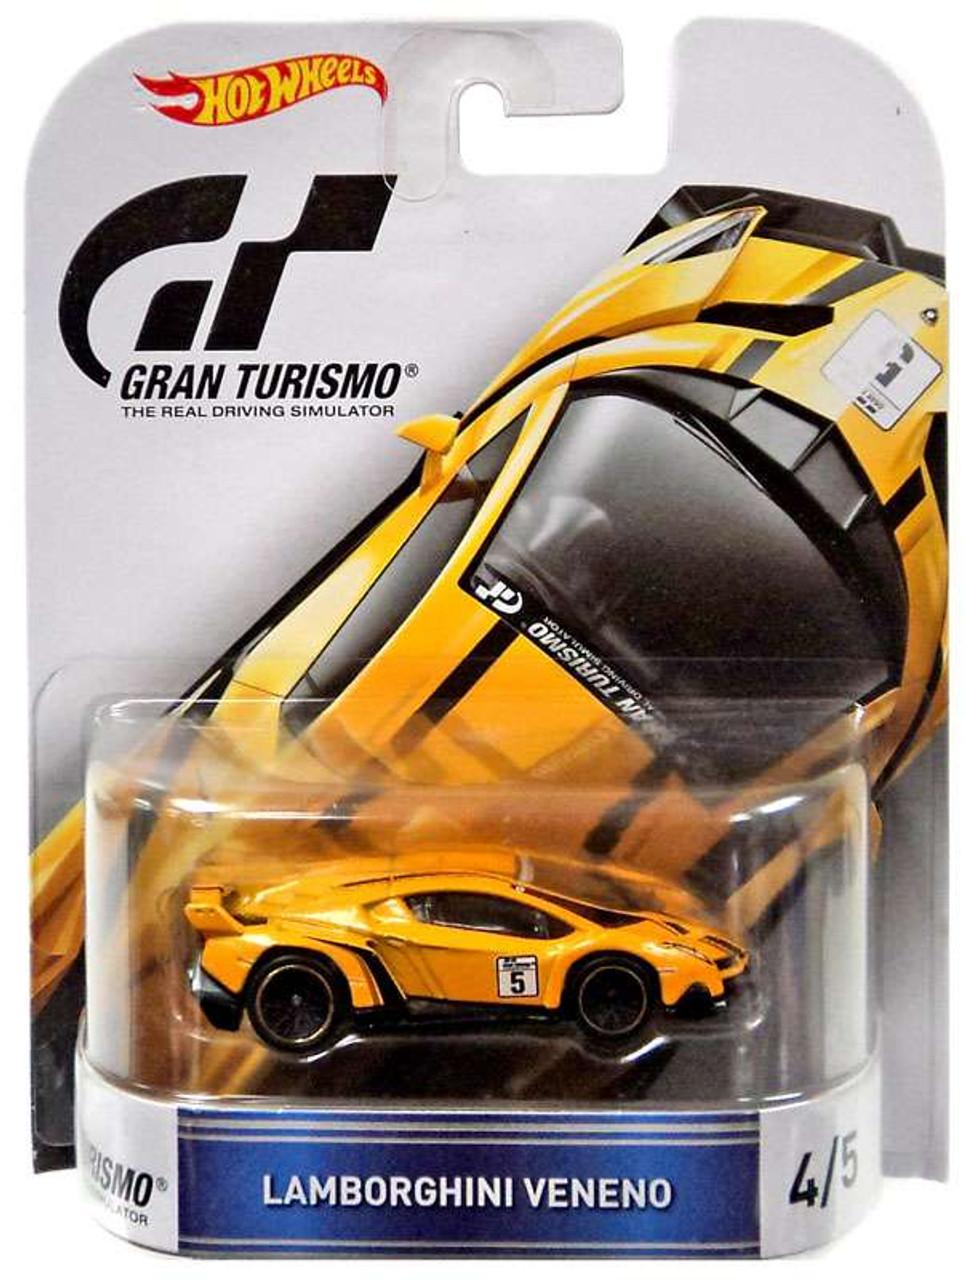 Hot Wheels Gran Turismo Lamborghini Veneno 164 Die Cast Car 45 Mattel Toys Toywiz